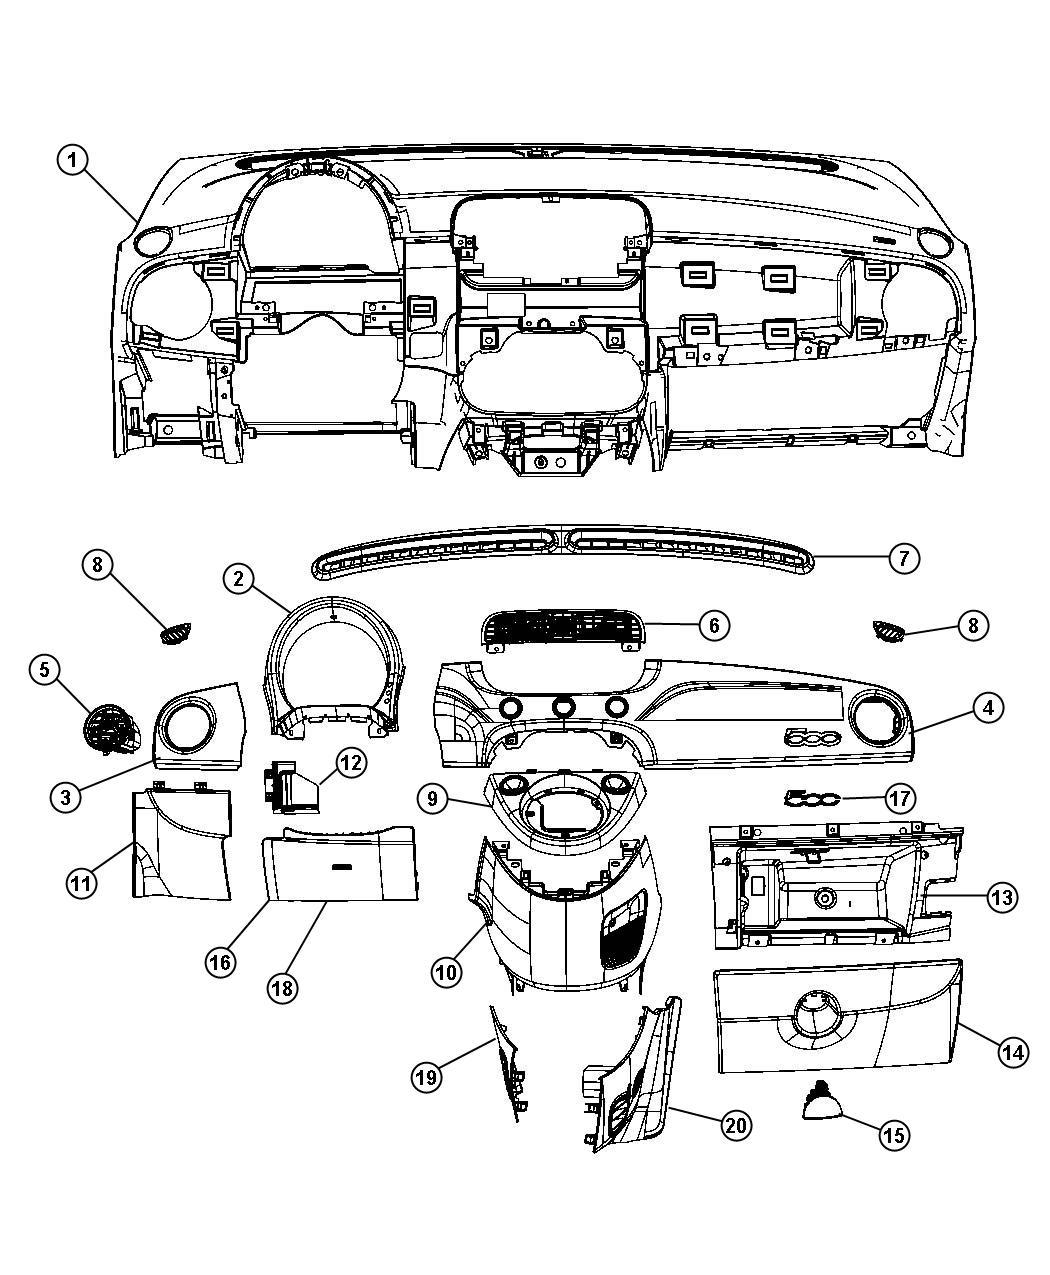 Diagram Suzuki Swift Wiring Diagram Espa Ol Full